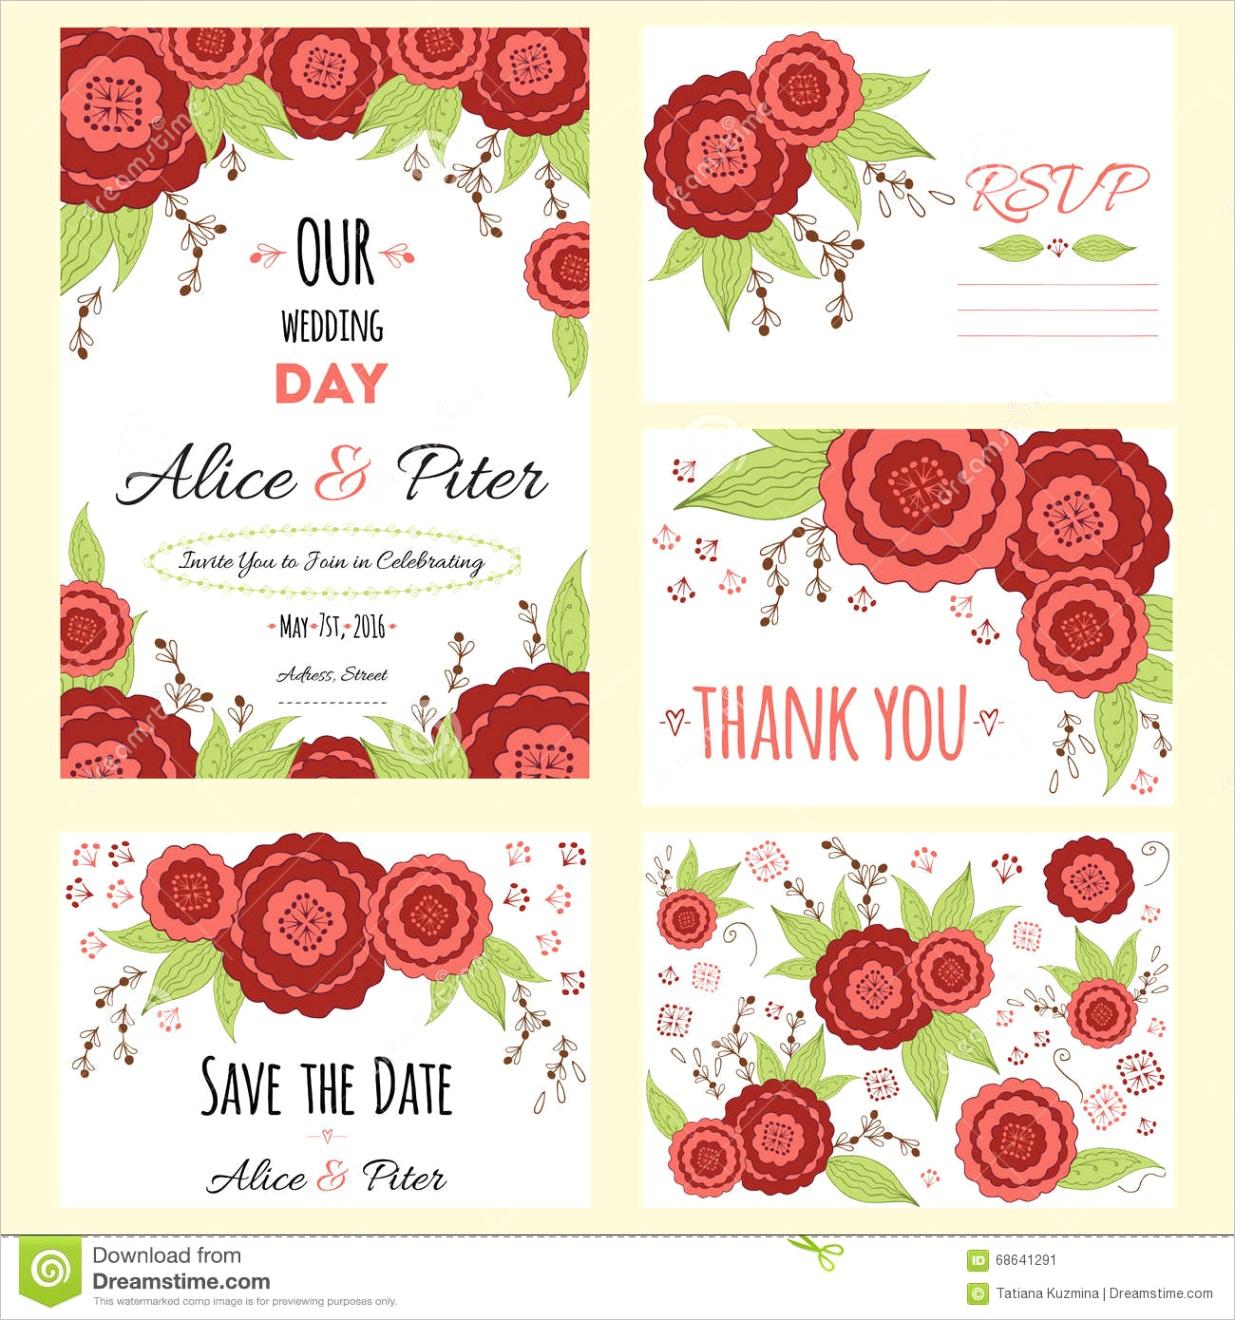 stock illustration wedding invitation thank you card save date cards wedding set rsvp card template envelope marriage event valentine image